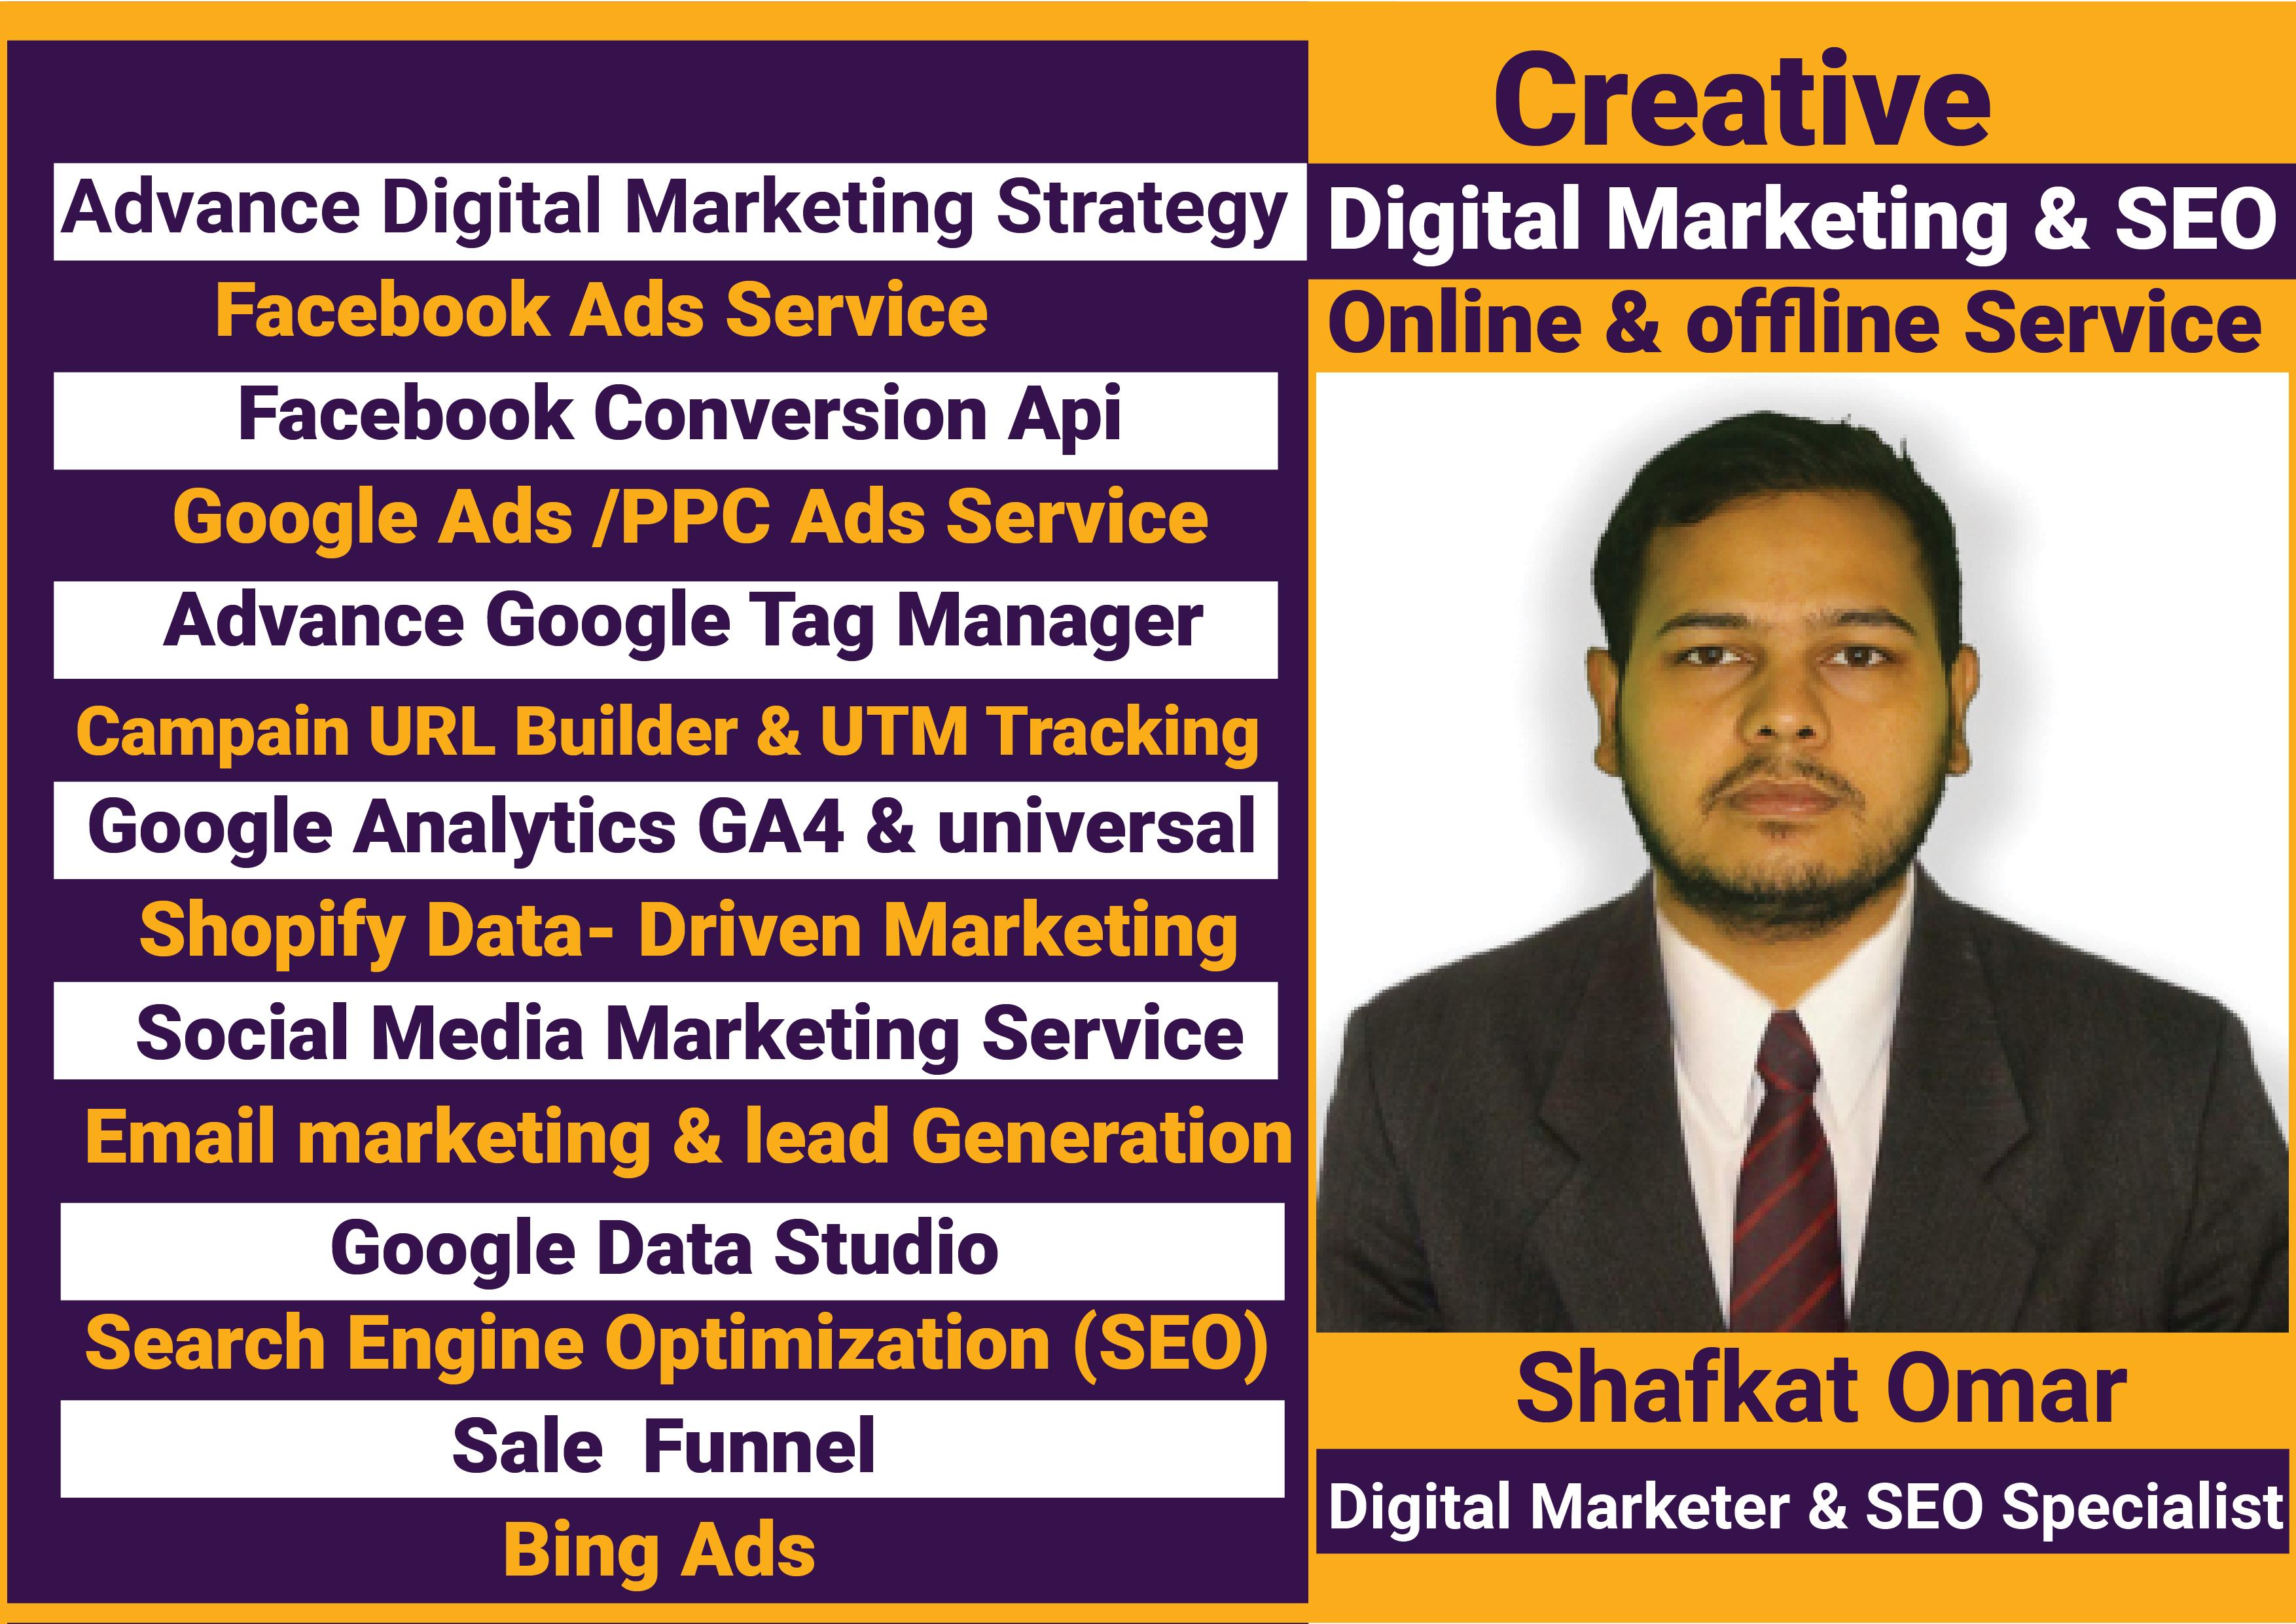 Digital marketing and SEO Online Service